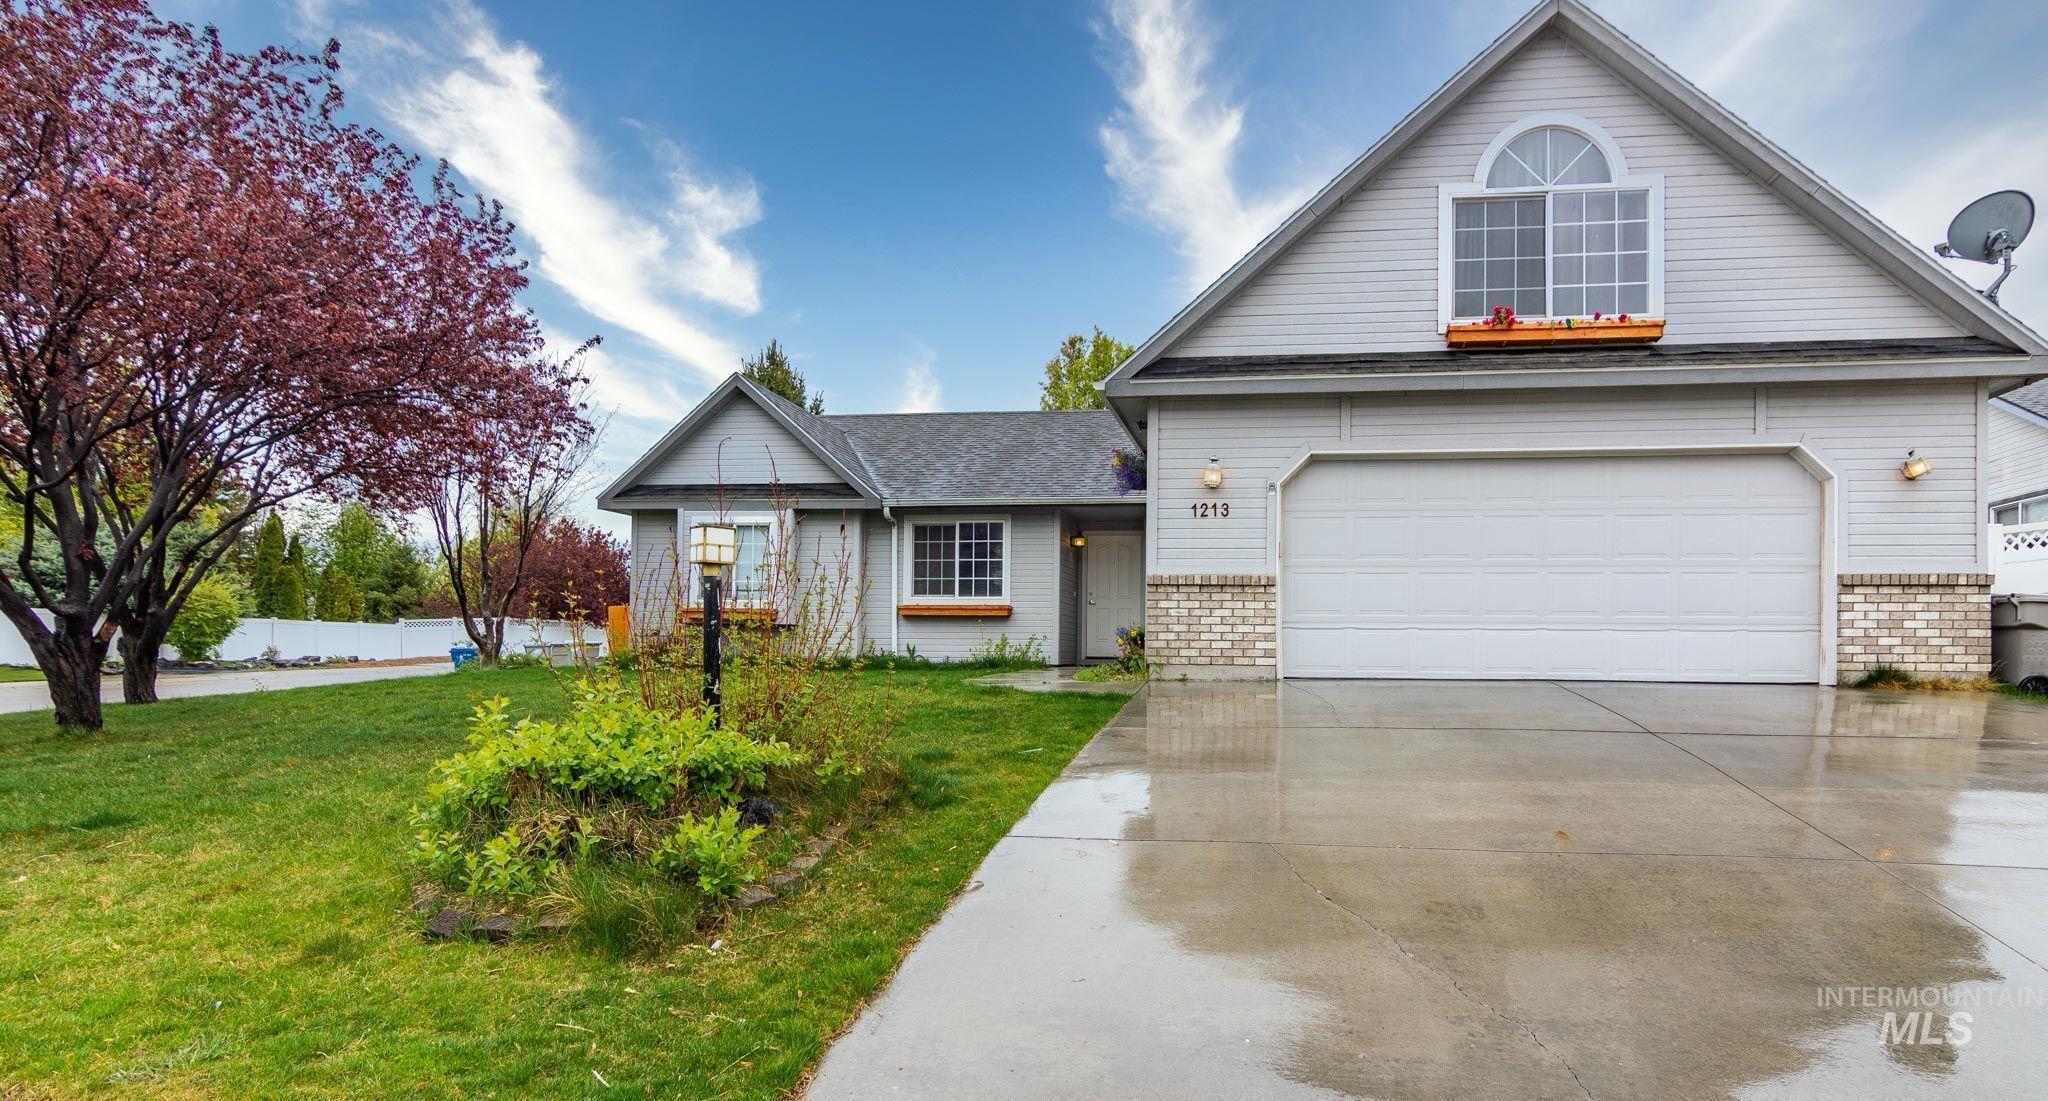 1213 E Desert View Way Property Photo - Nampa, ID real estate listing